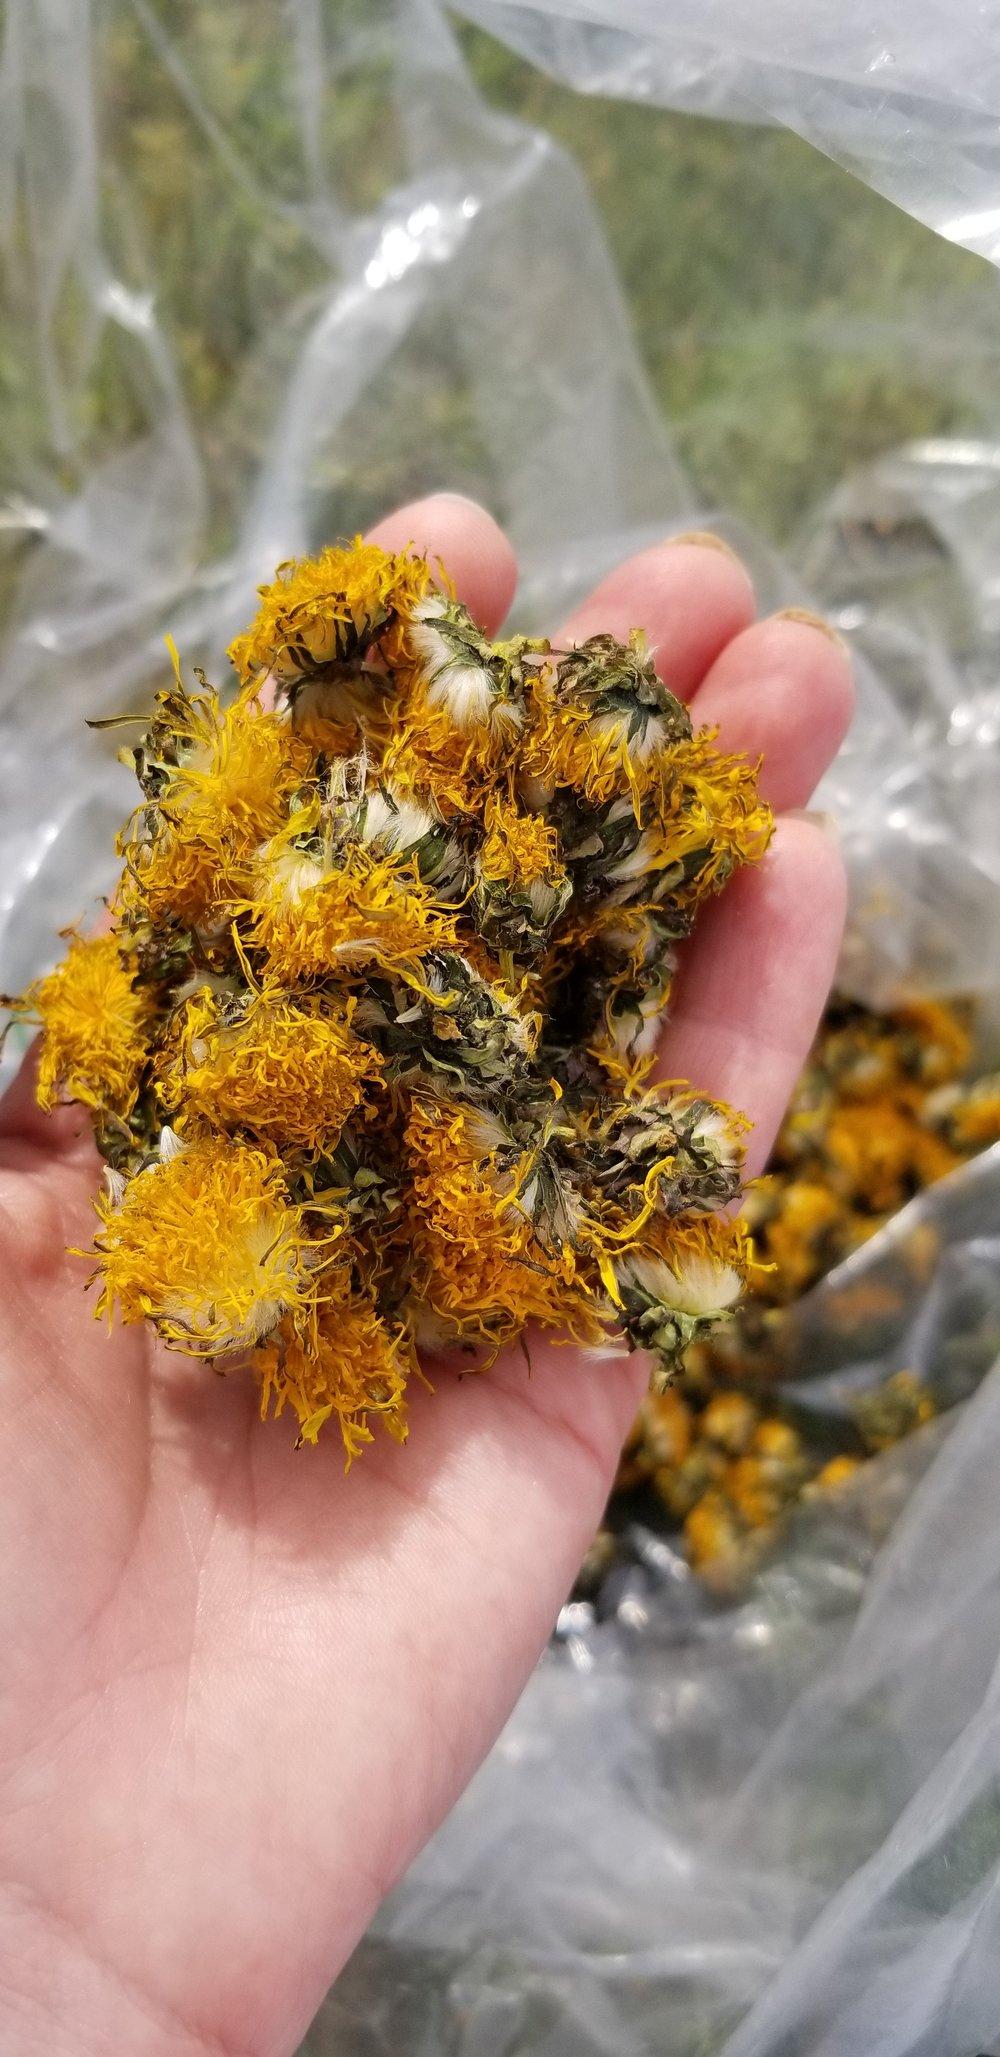 dried dandelions for biodynamic preparations, photo by Kelly Magyarics